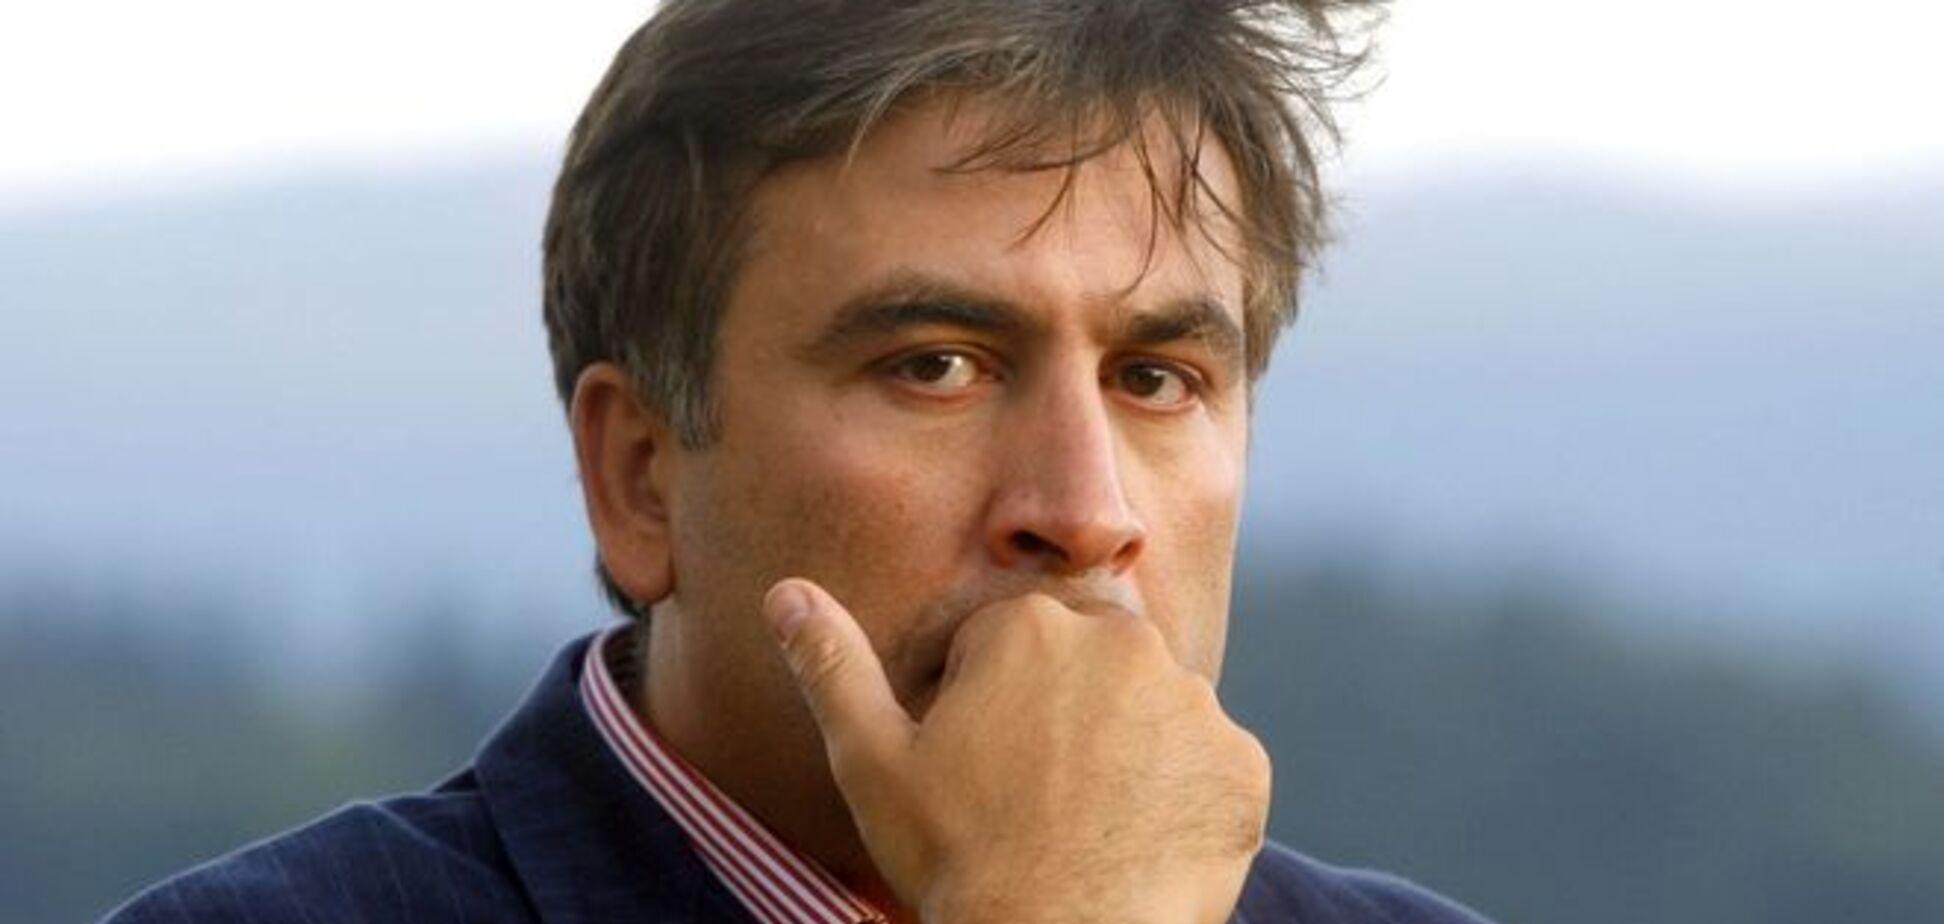 Назначение Саакашвили: 'Шоб було красиво'